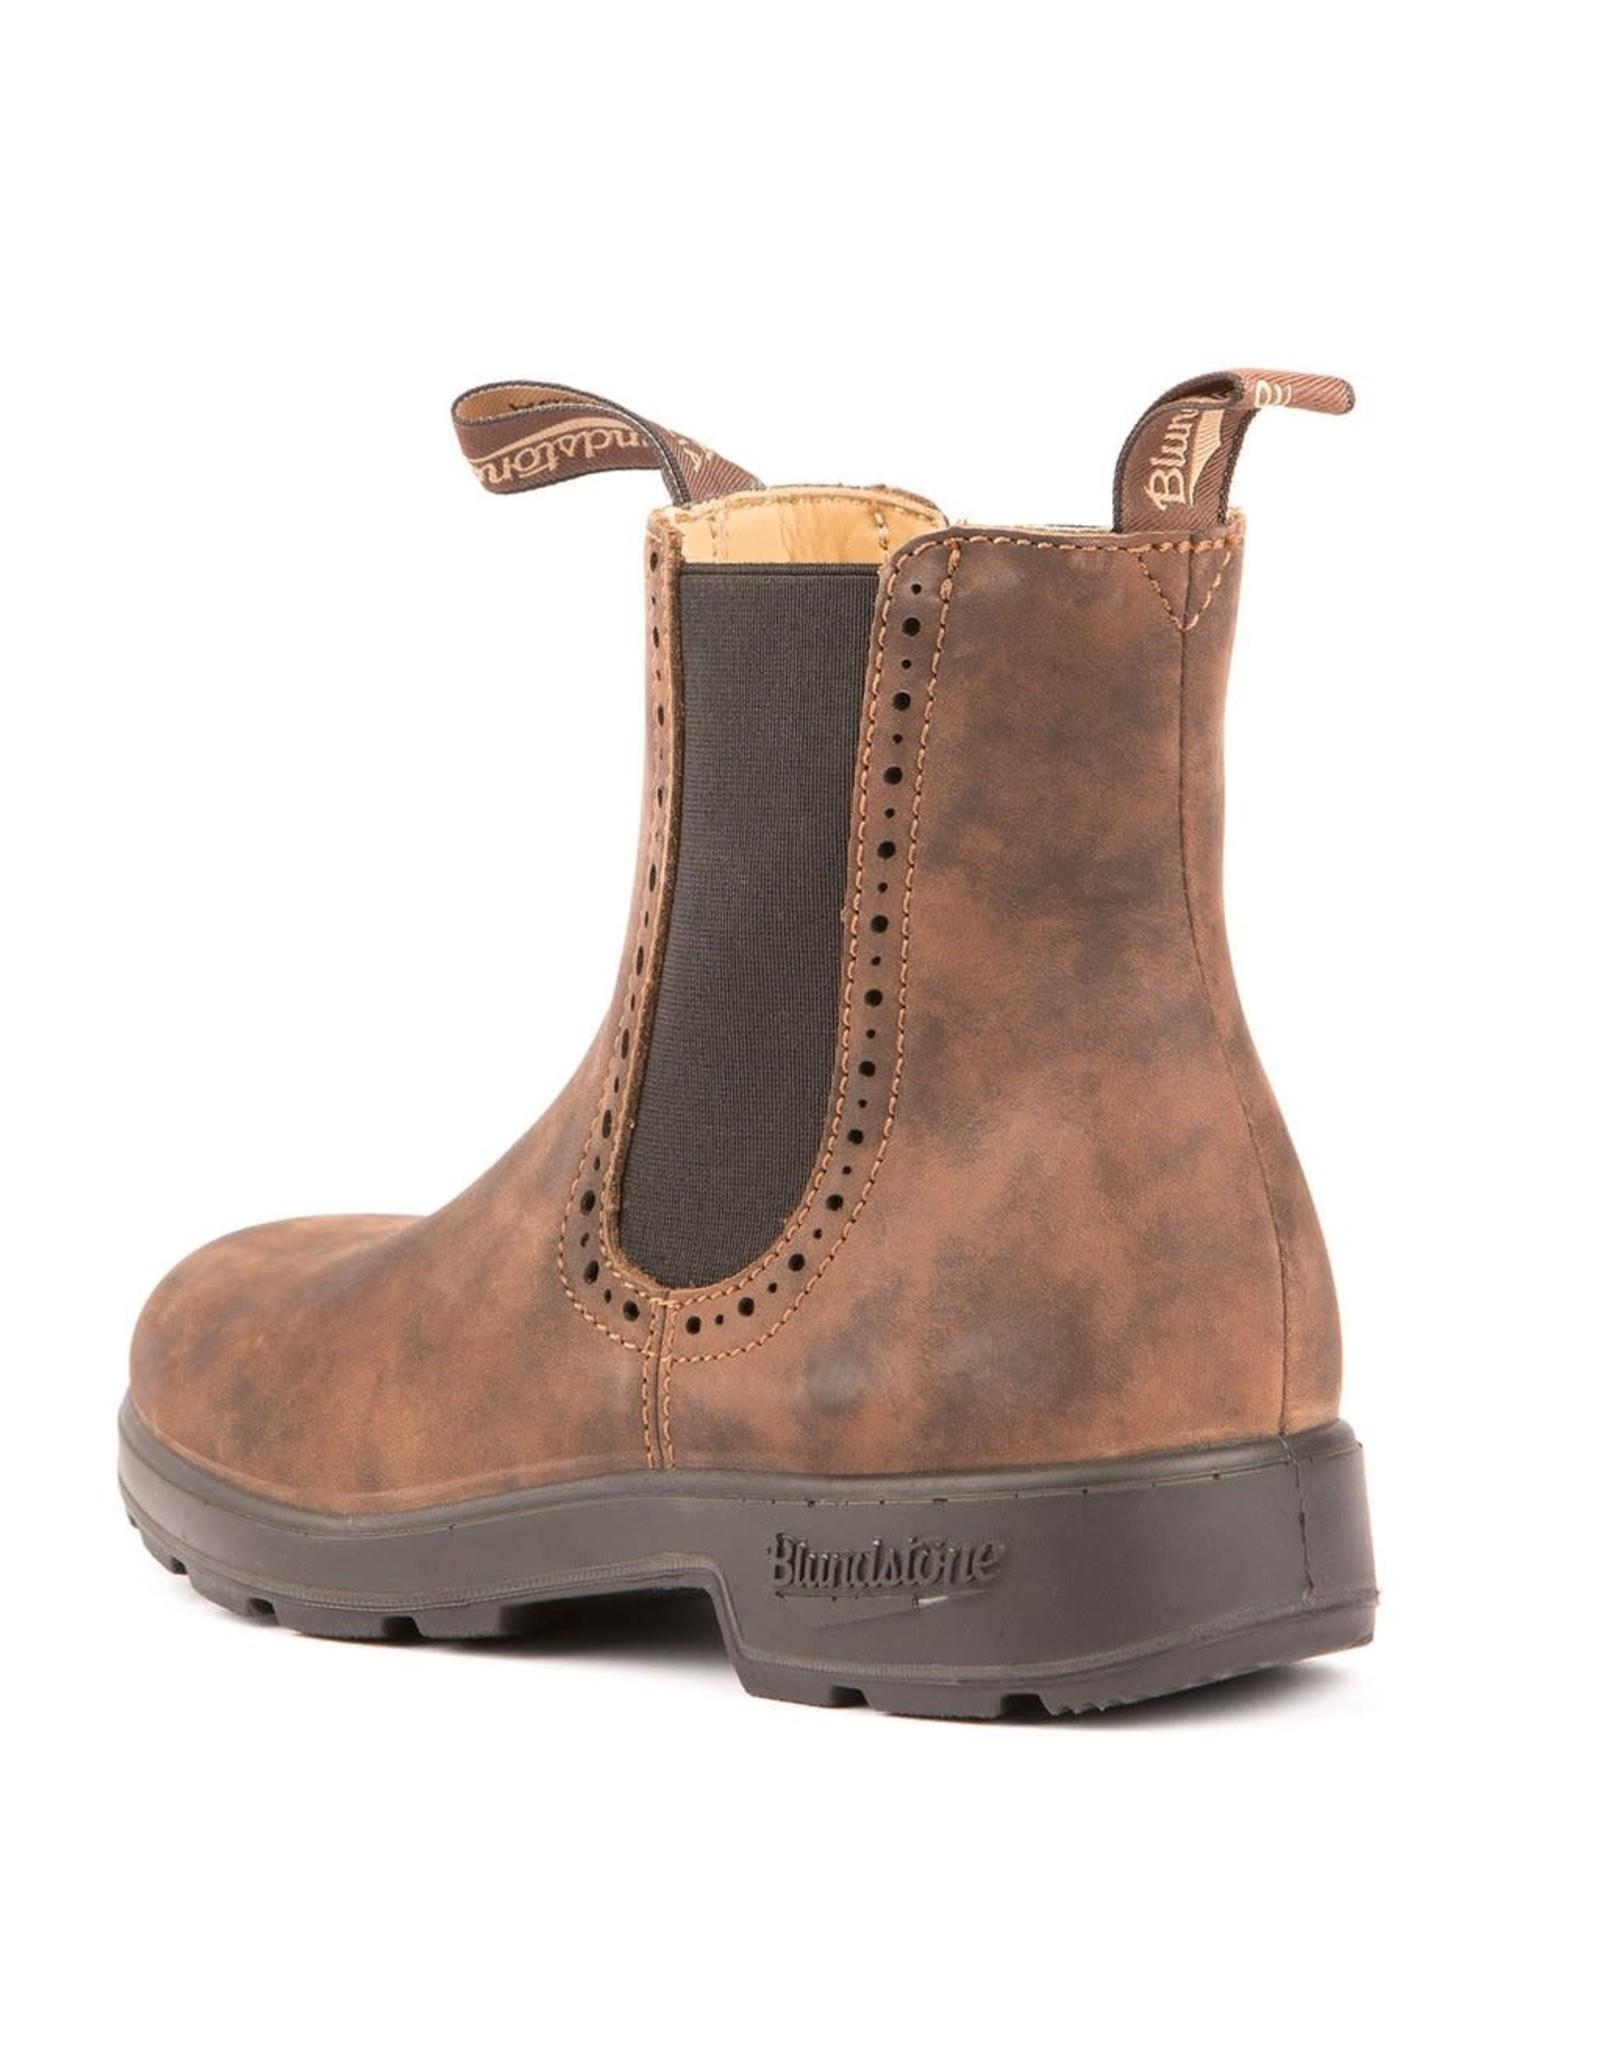 Blundstone Blundstone 1351 (rustic brown)